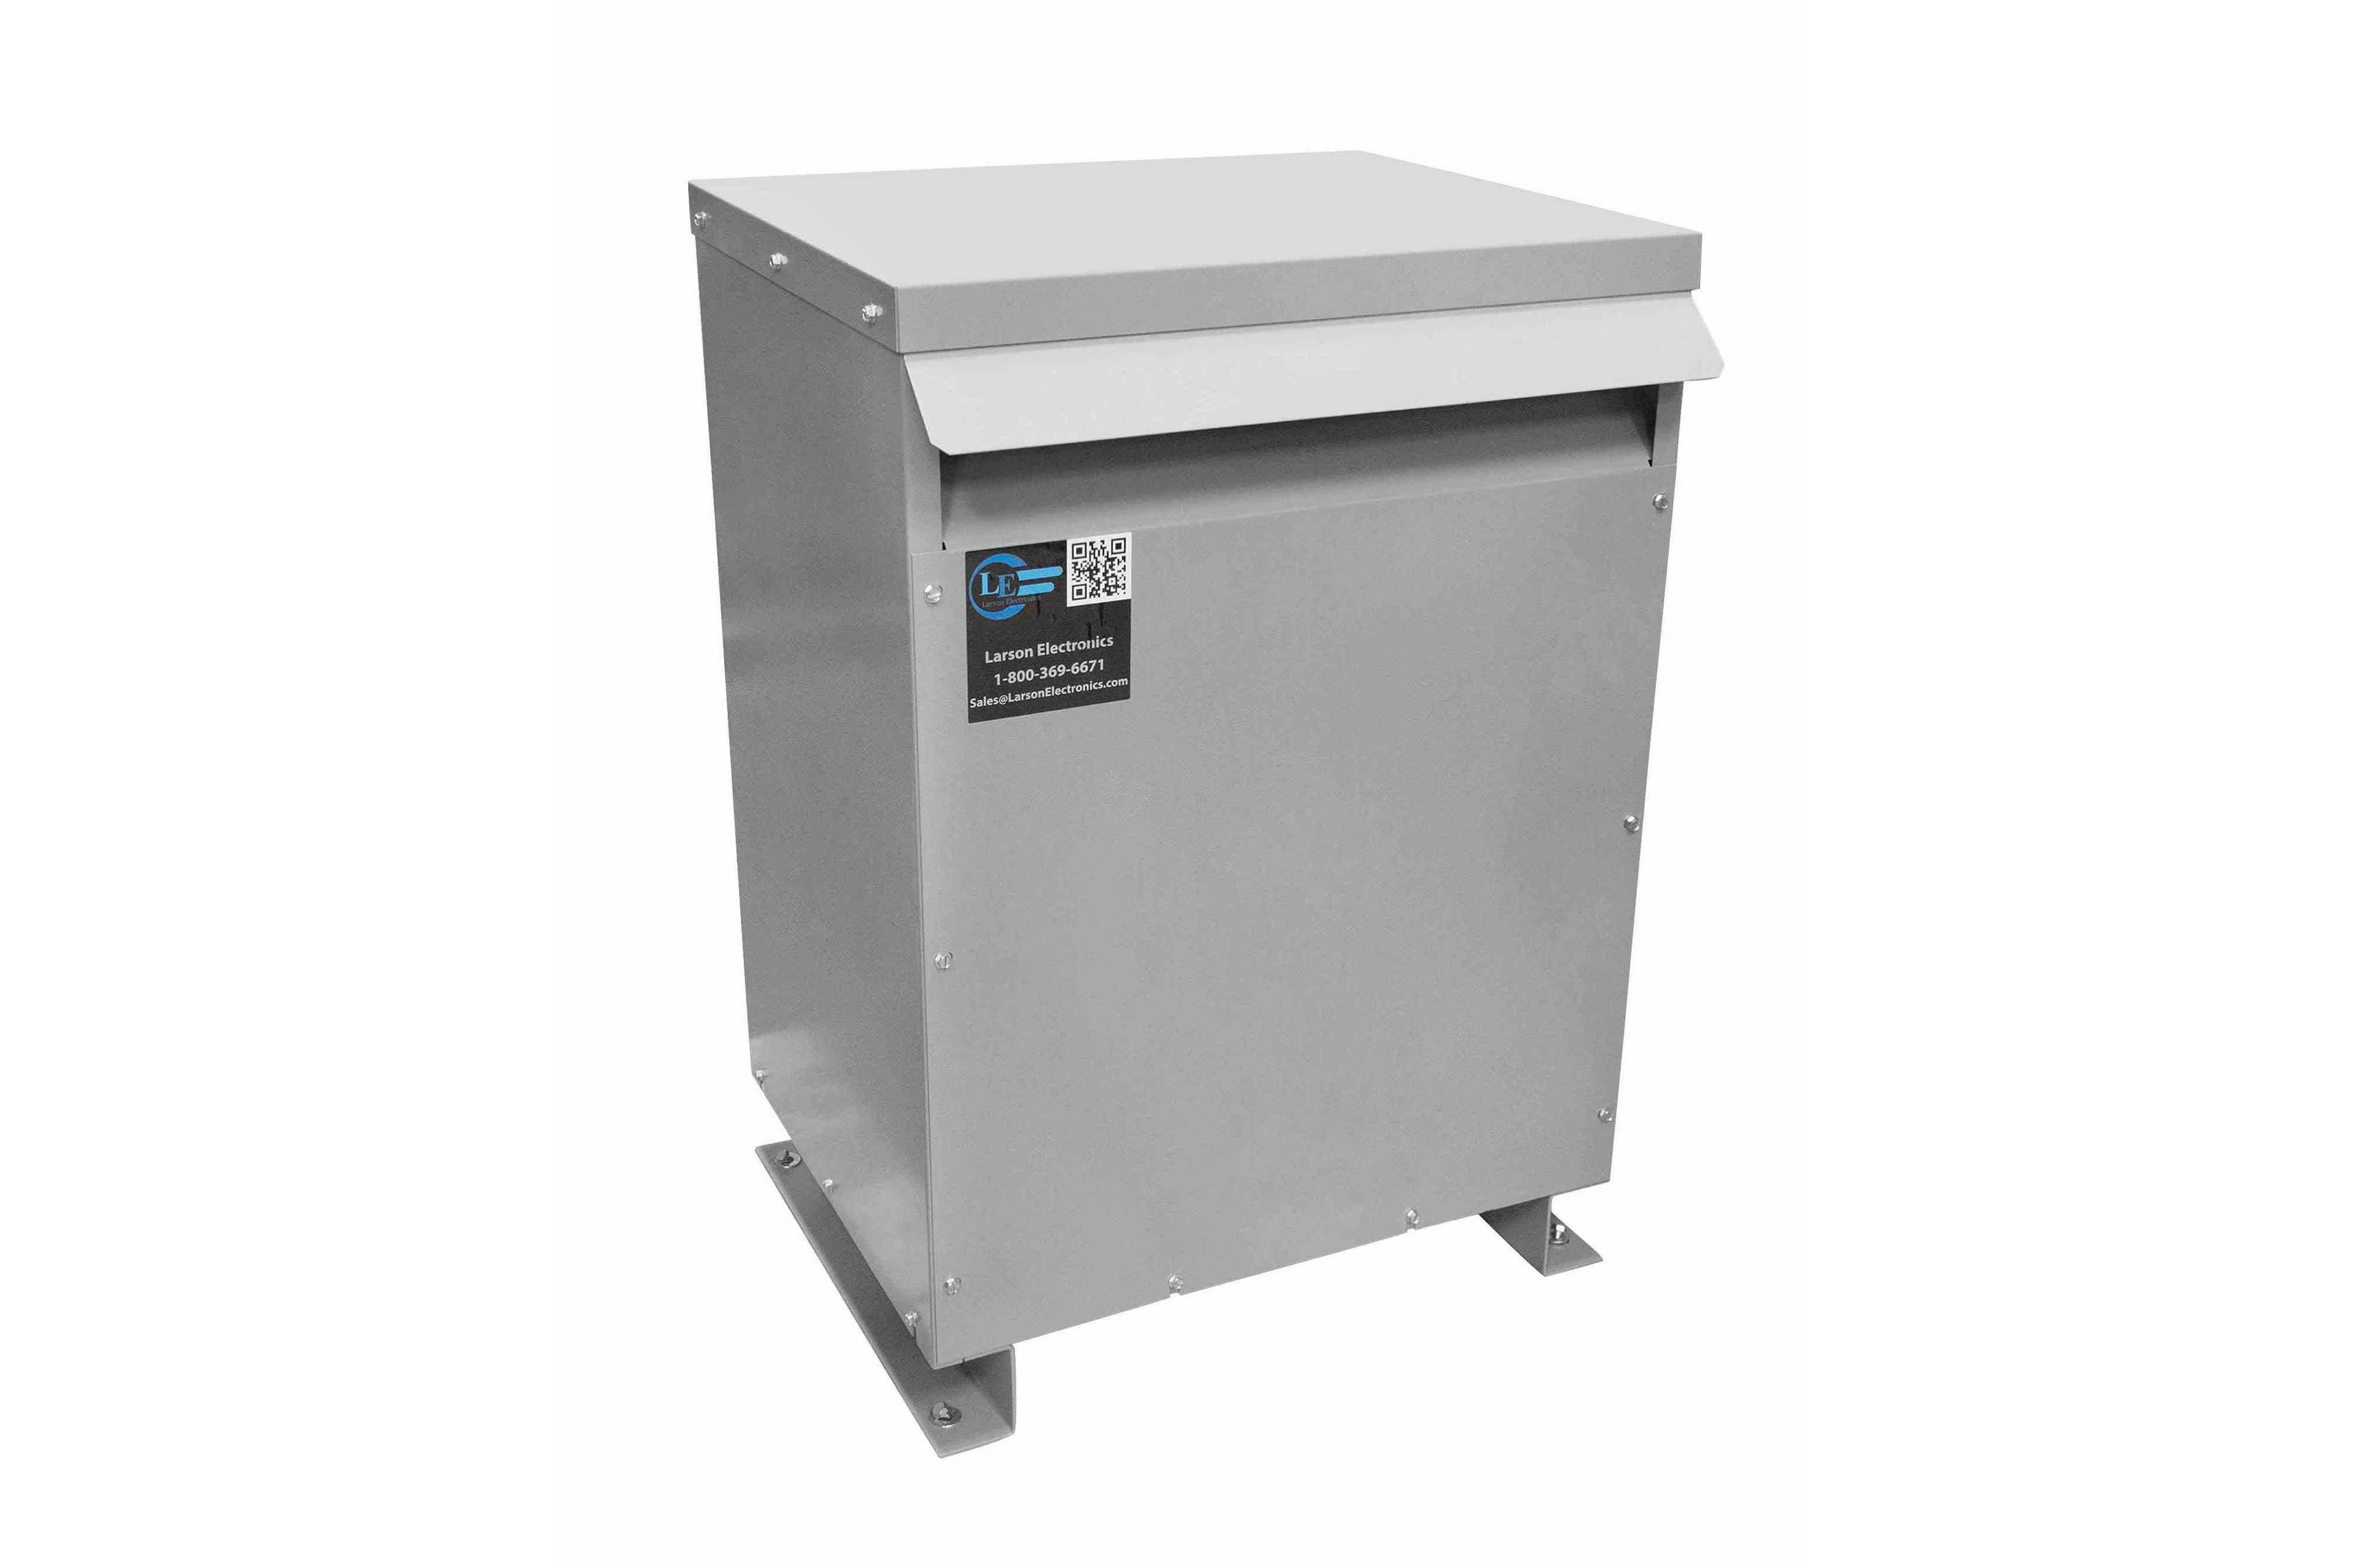 275 kVA 3PH Isolation Transformer, 480V Wye Primary, 575V Delta Secondary, N3R, Ventilated, 60 Hz